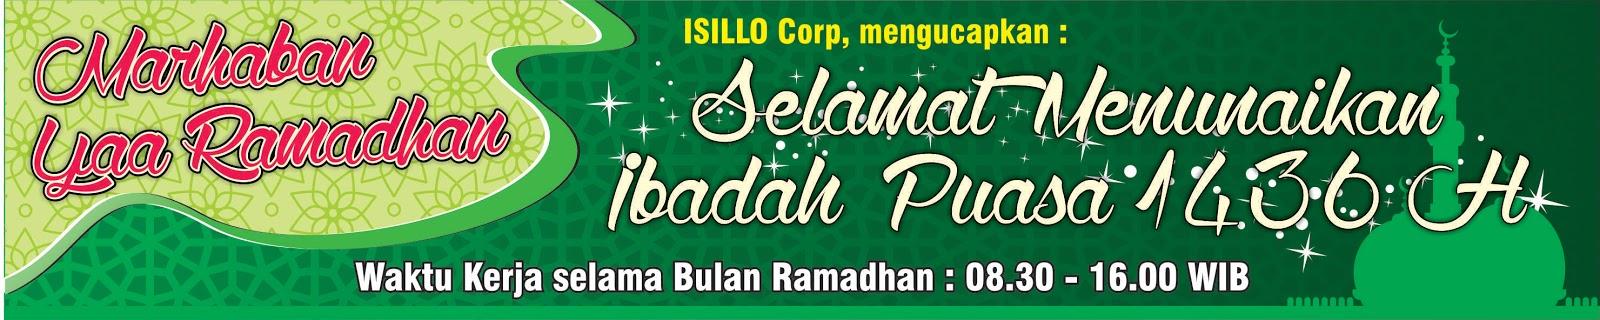 Greenart World Wide Info Desain Banner Ramadhan H